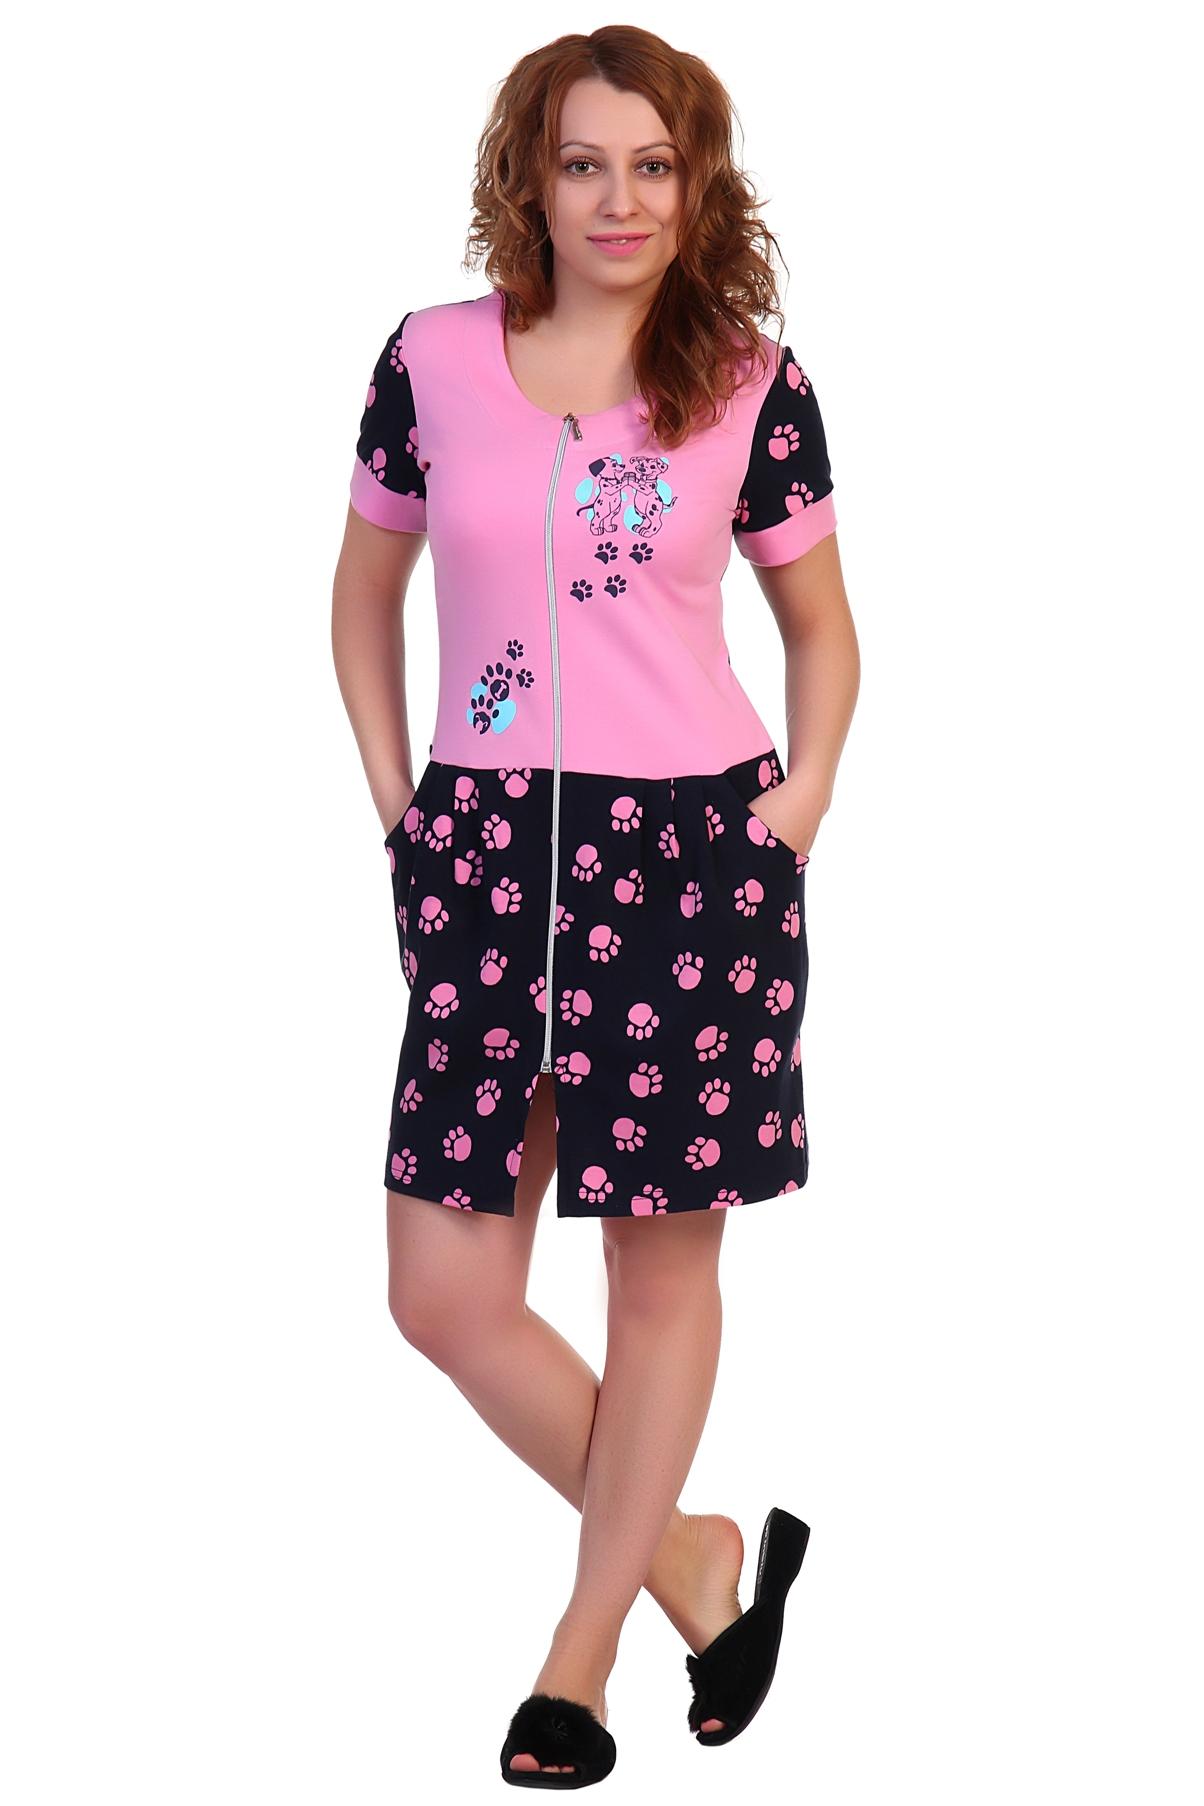 Жен. халат арт. 16-0298 Розовый р. 54 - Женская одежда артикул: 34187